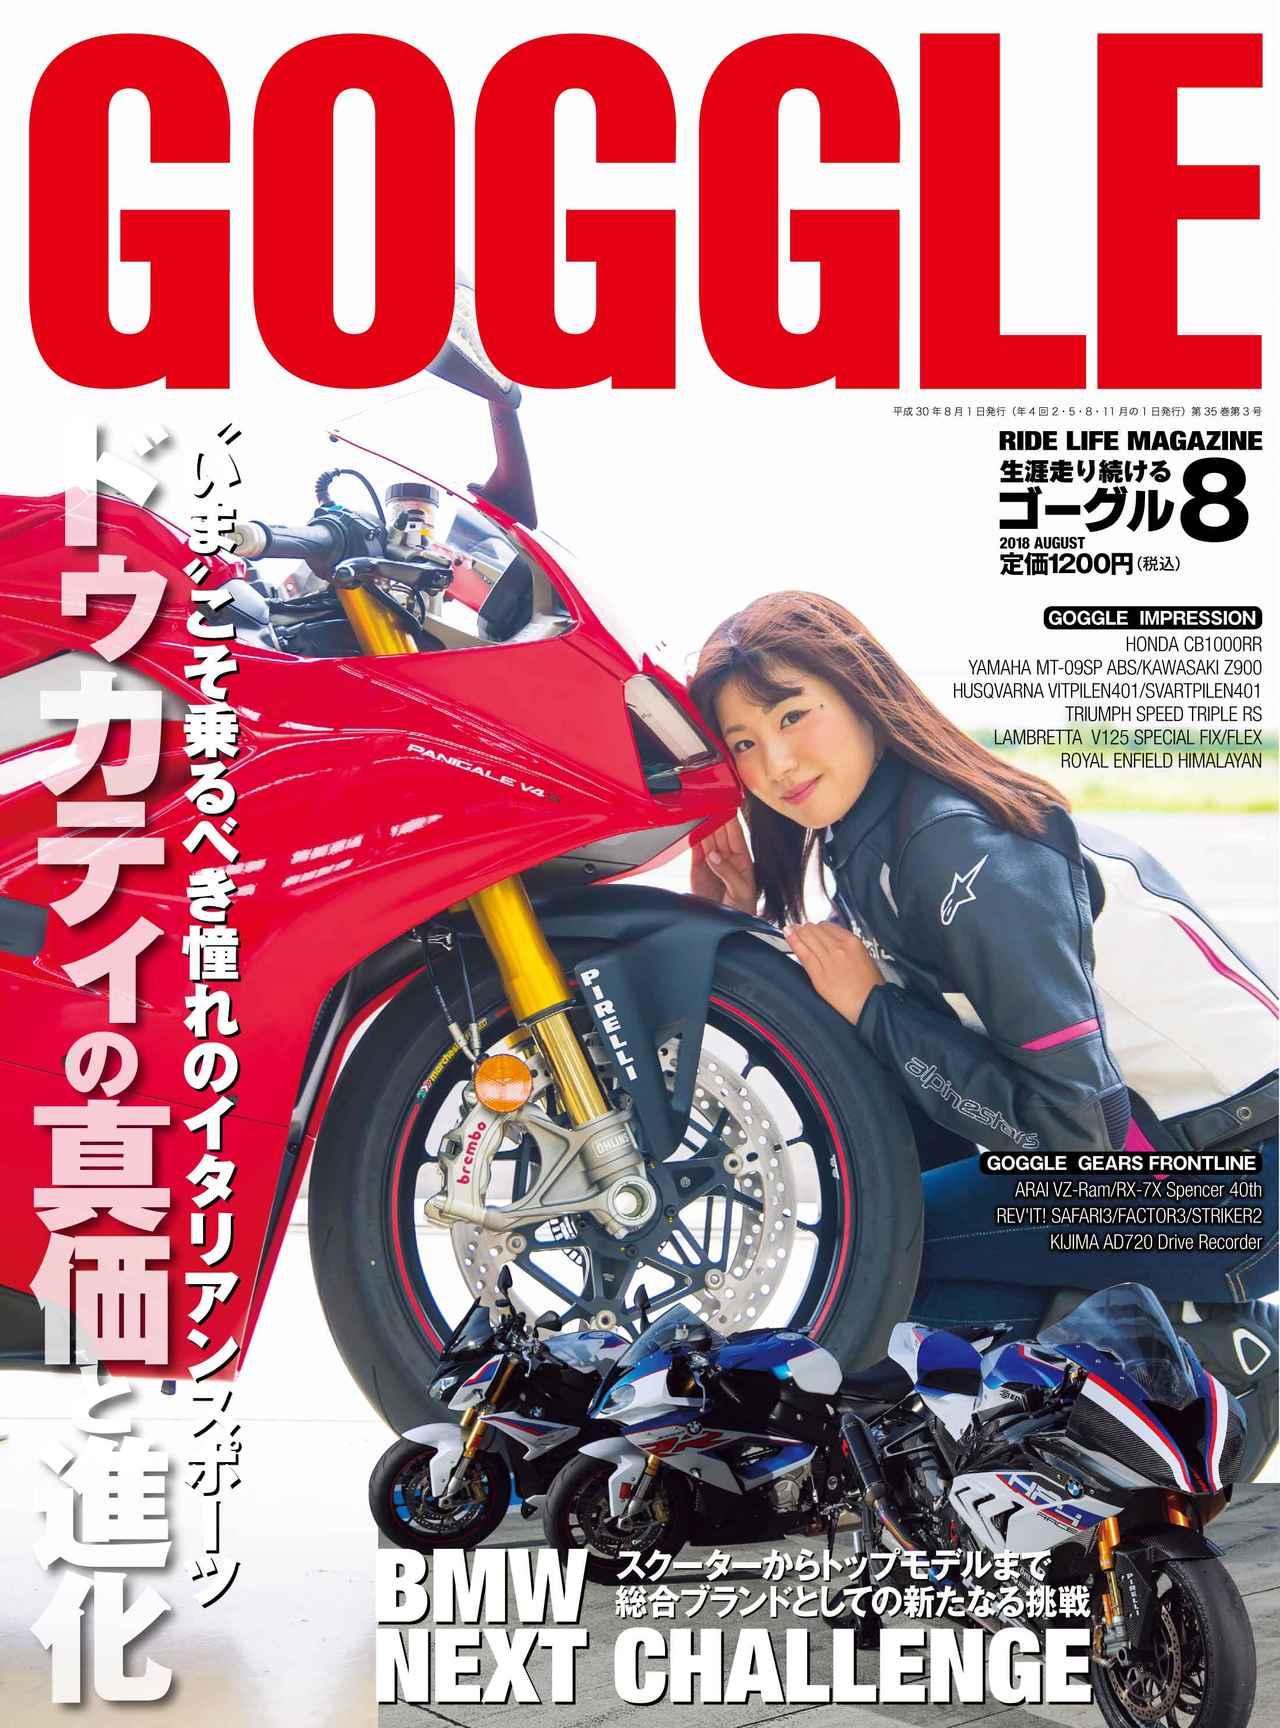 画像: DUCATI PANIGALE V4S 価格:3,280,000円(税込)